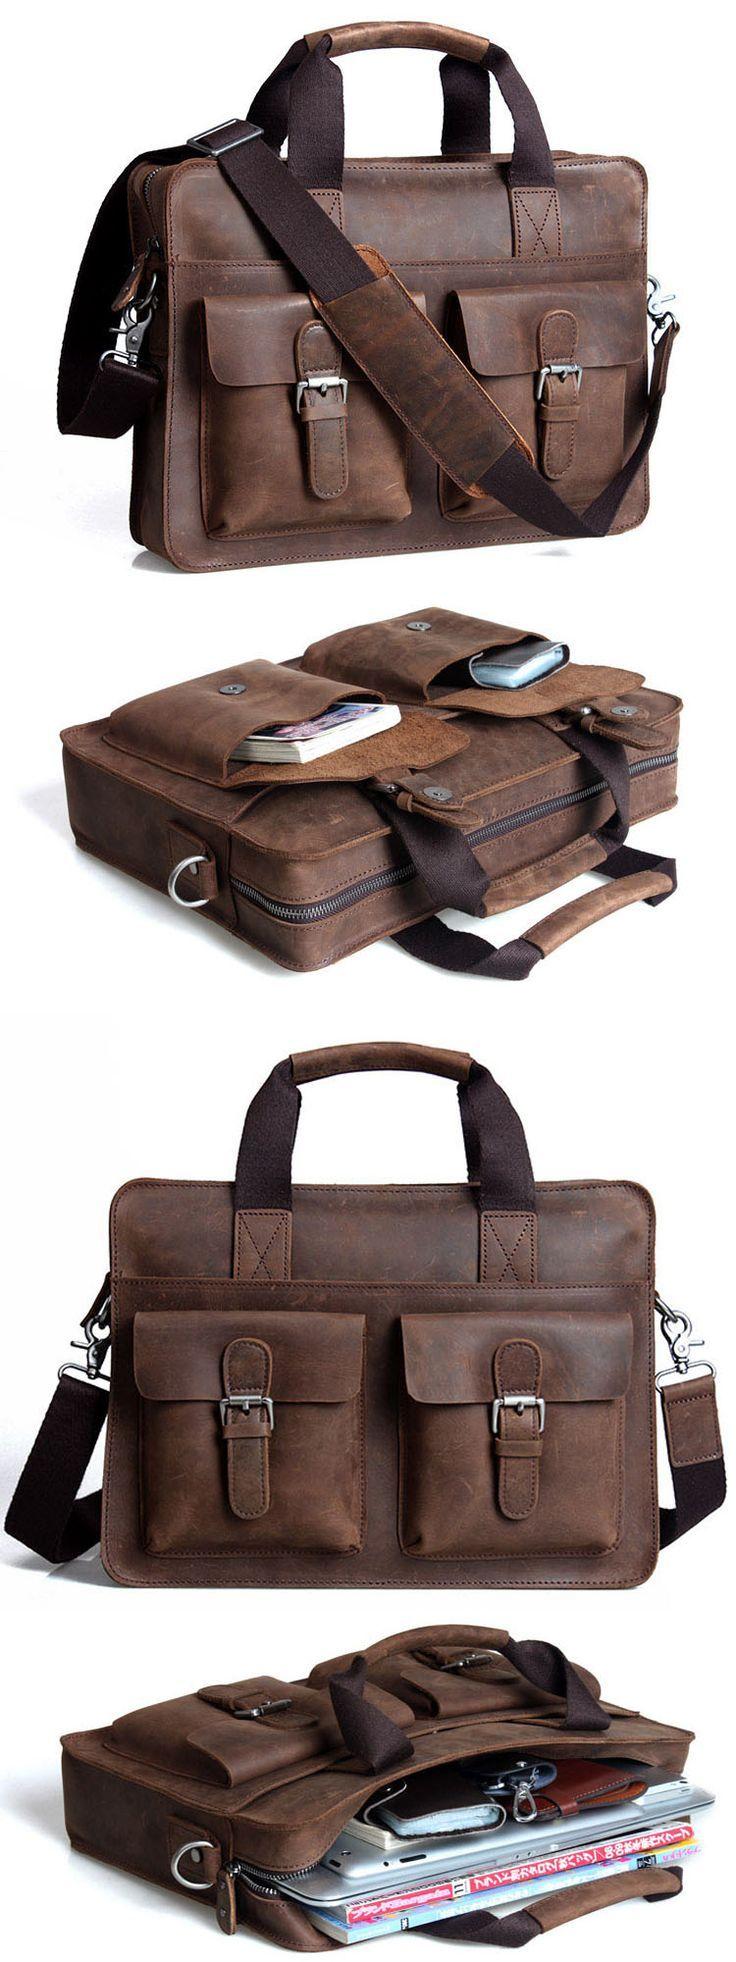 "Handmade Crazy Horse Leather Briefcase Messenger Shoulder Bag 13""14"" Laptop Macbook Ipad Bag - black shoulder bag, weekend bag, black ladies bag *sponsored https://www.pinterest.com/bags_bag/ https://www.pinterest.com/explore/bag/ https://www.pinterest.com/bags_bag/bags/ http://www.landsend.com/shop/mens-bags/-/N-kh7?brandCode=classic"